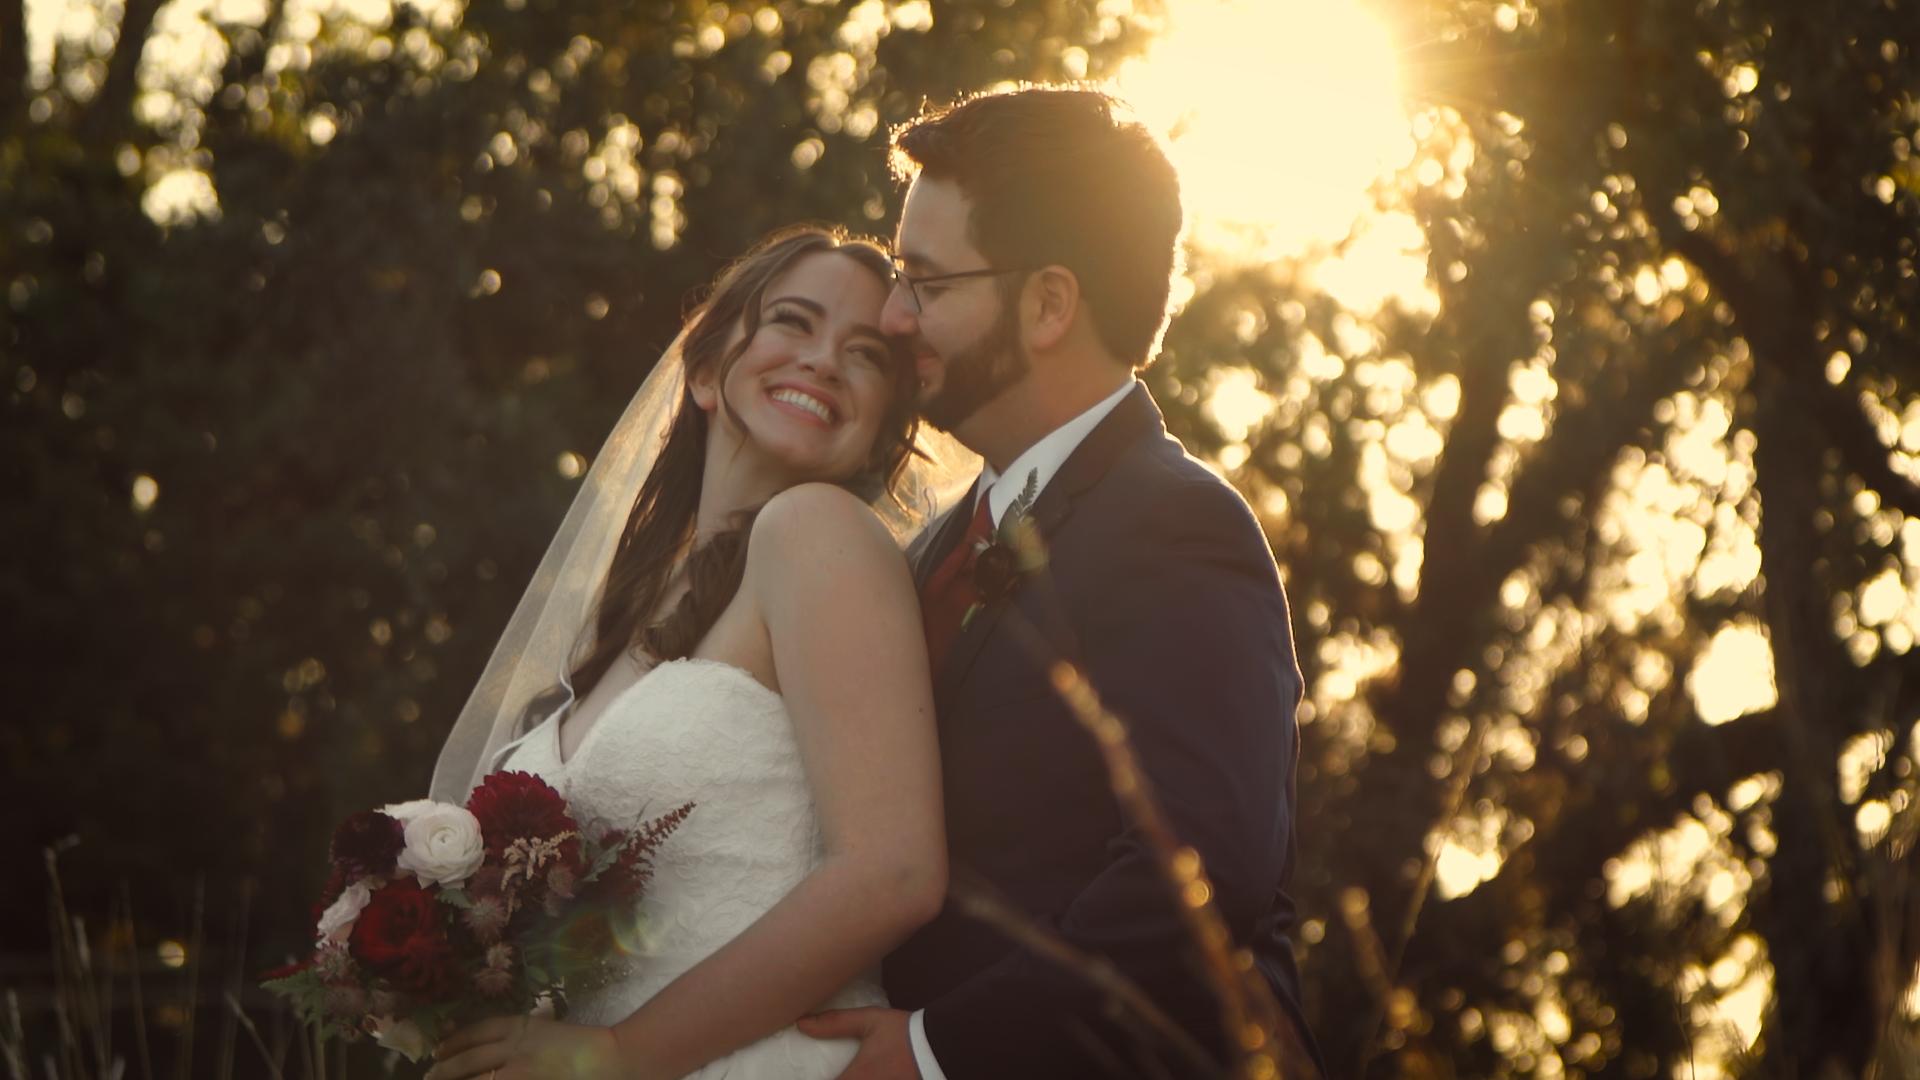 Rebecca_and_Daniel_Wedding_Austin_Texas_Vista_West_Ranch30.png